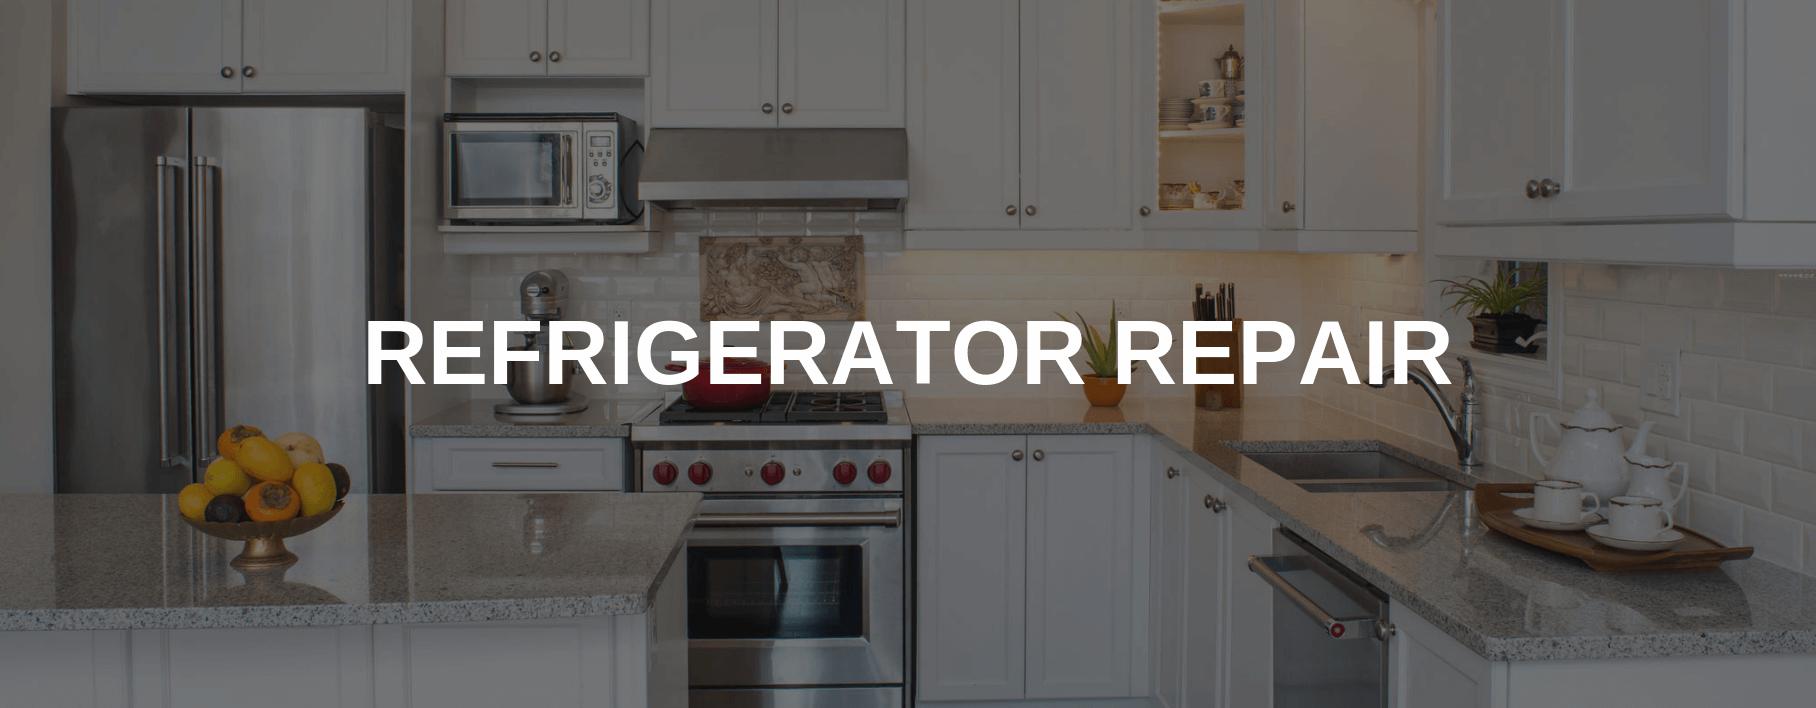 dayton refrigerator repair